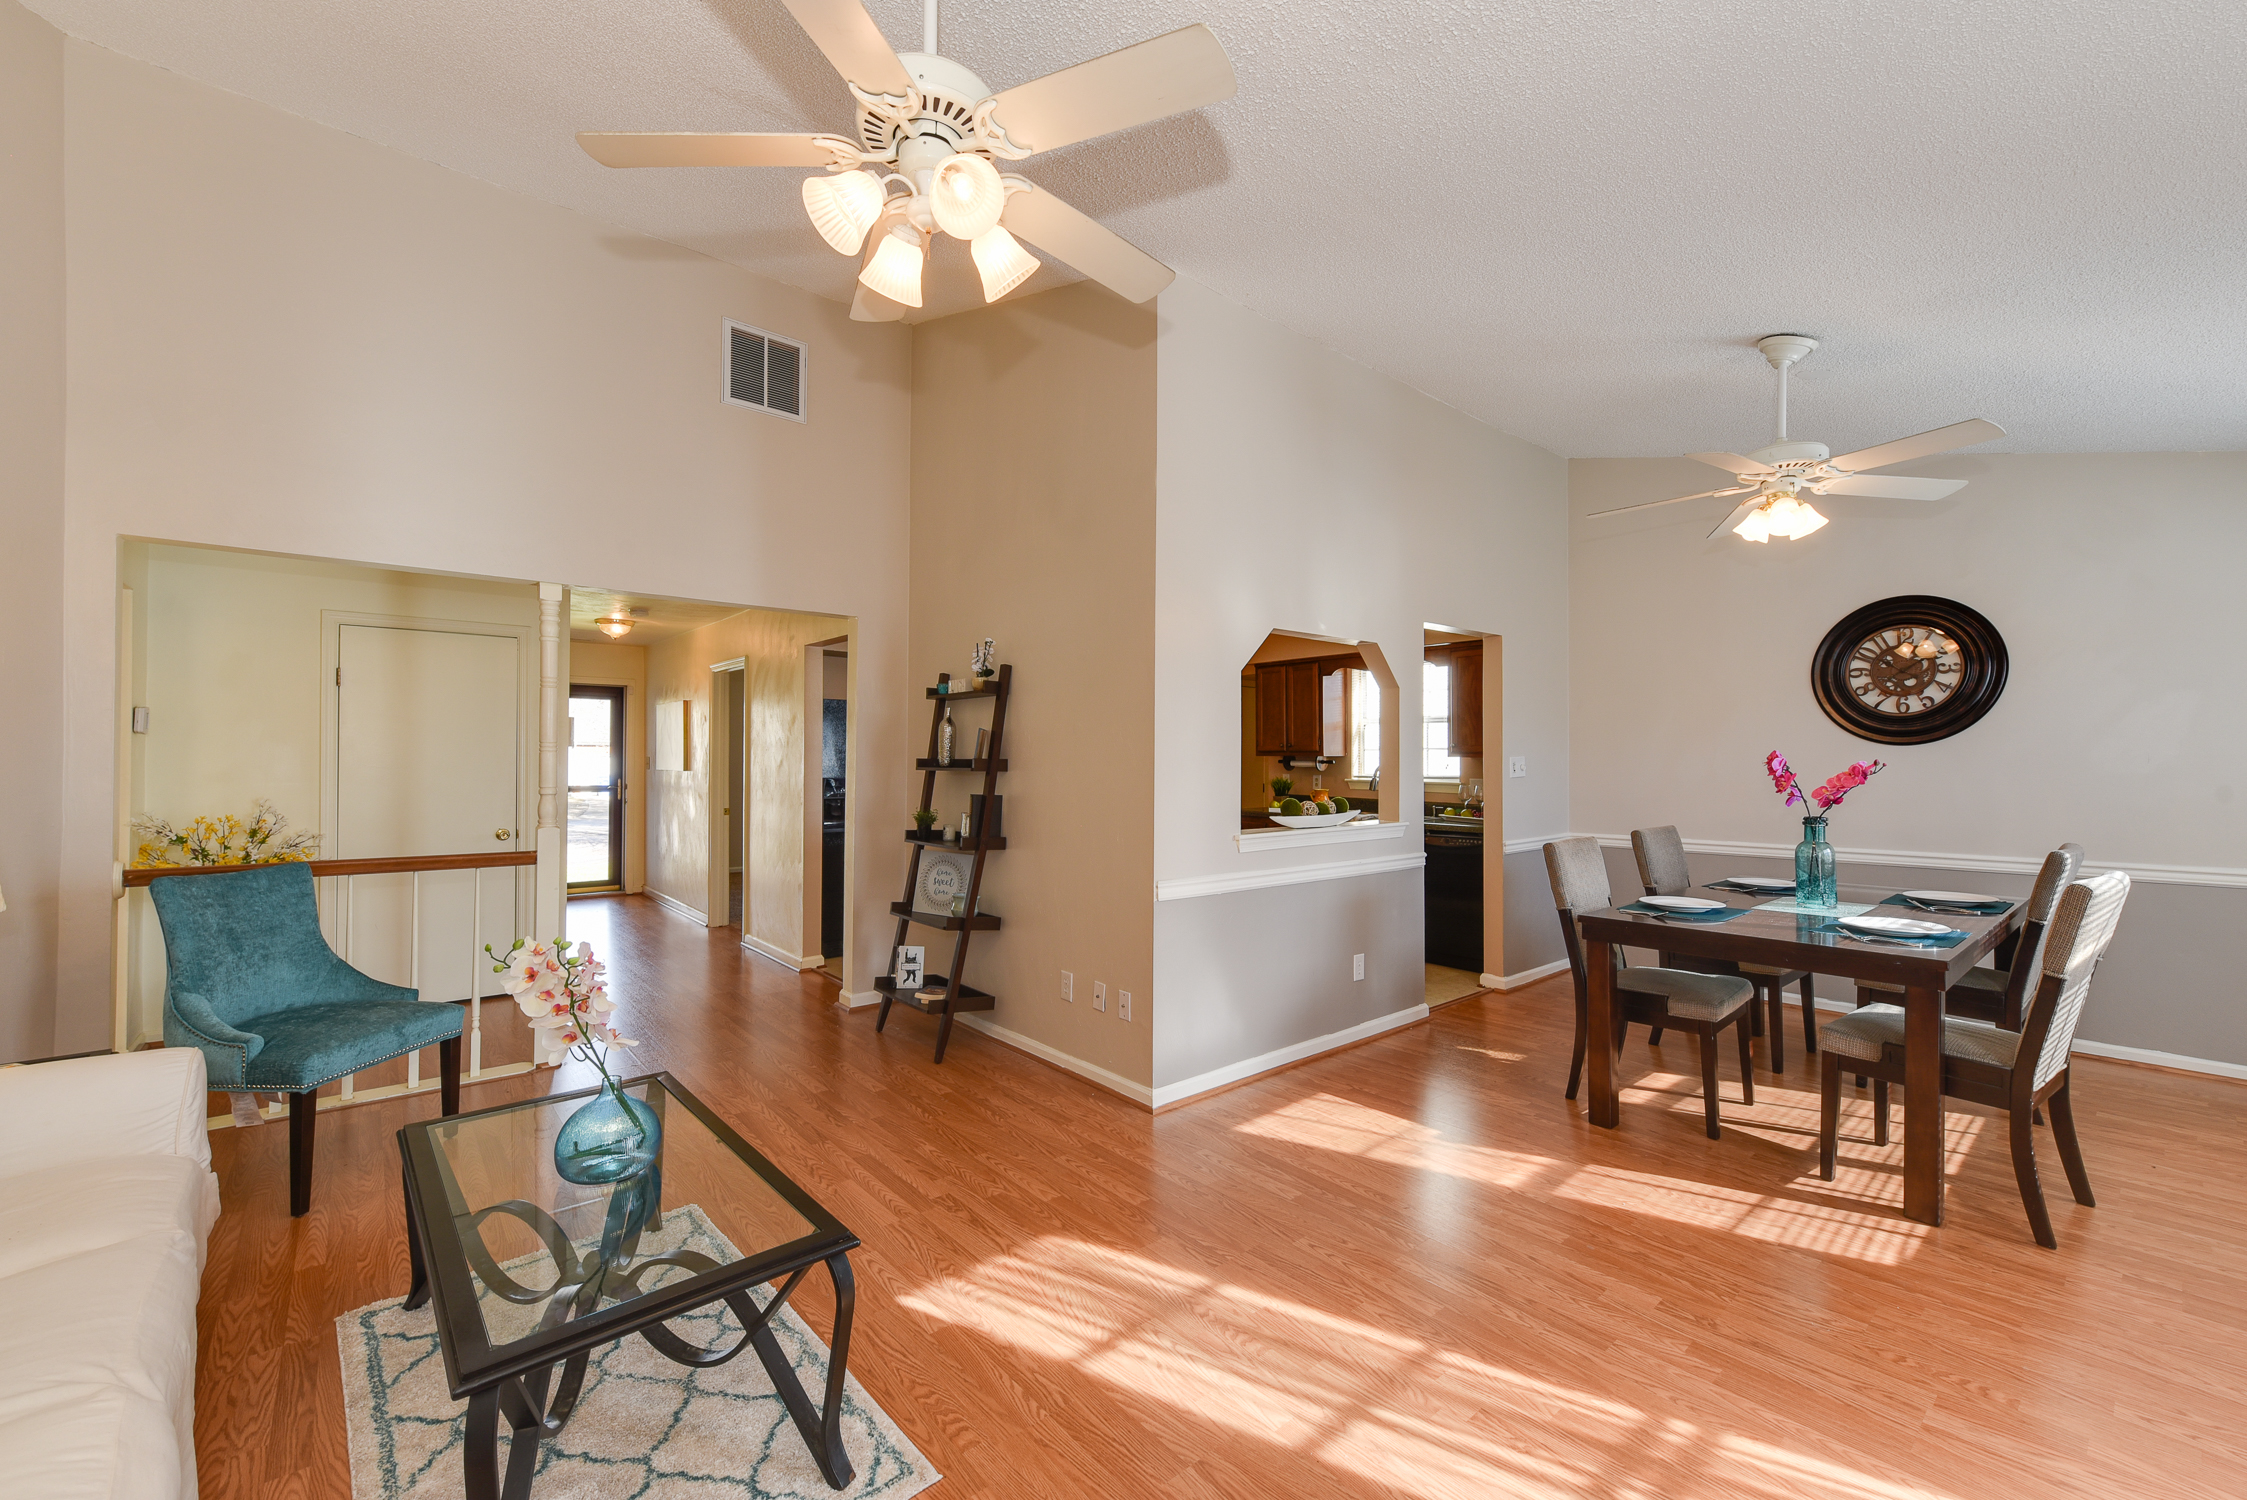 Home For Sale: 3201 Bent Branch Ct, Chesapeake VA 23323